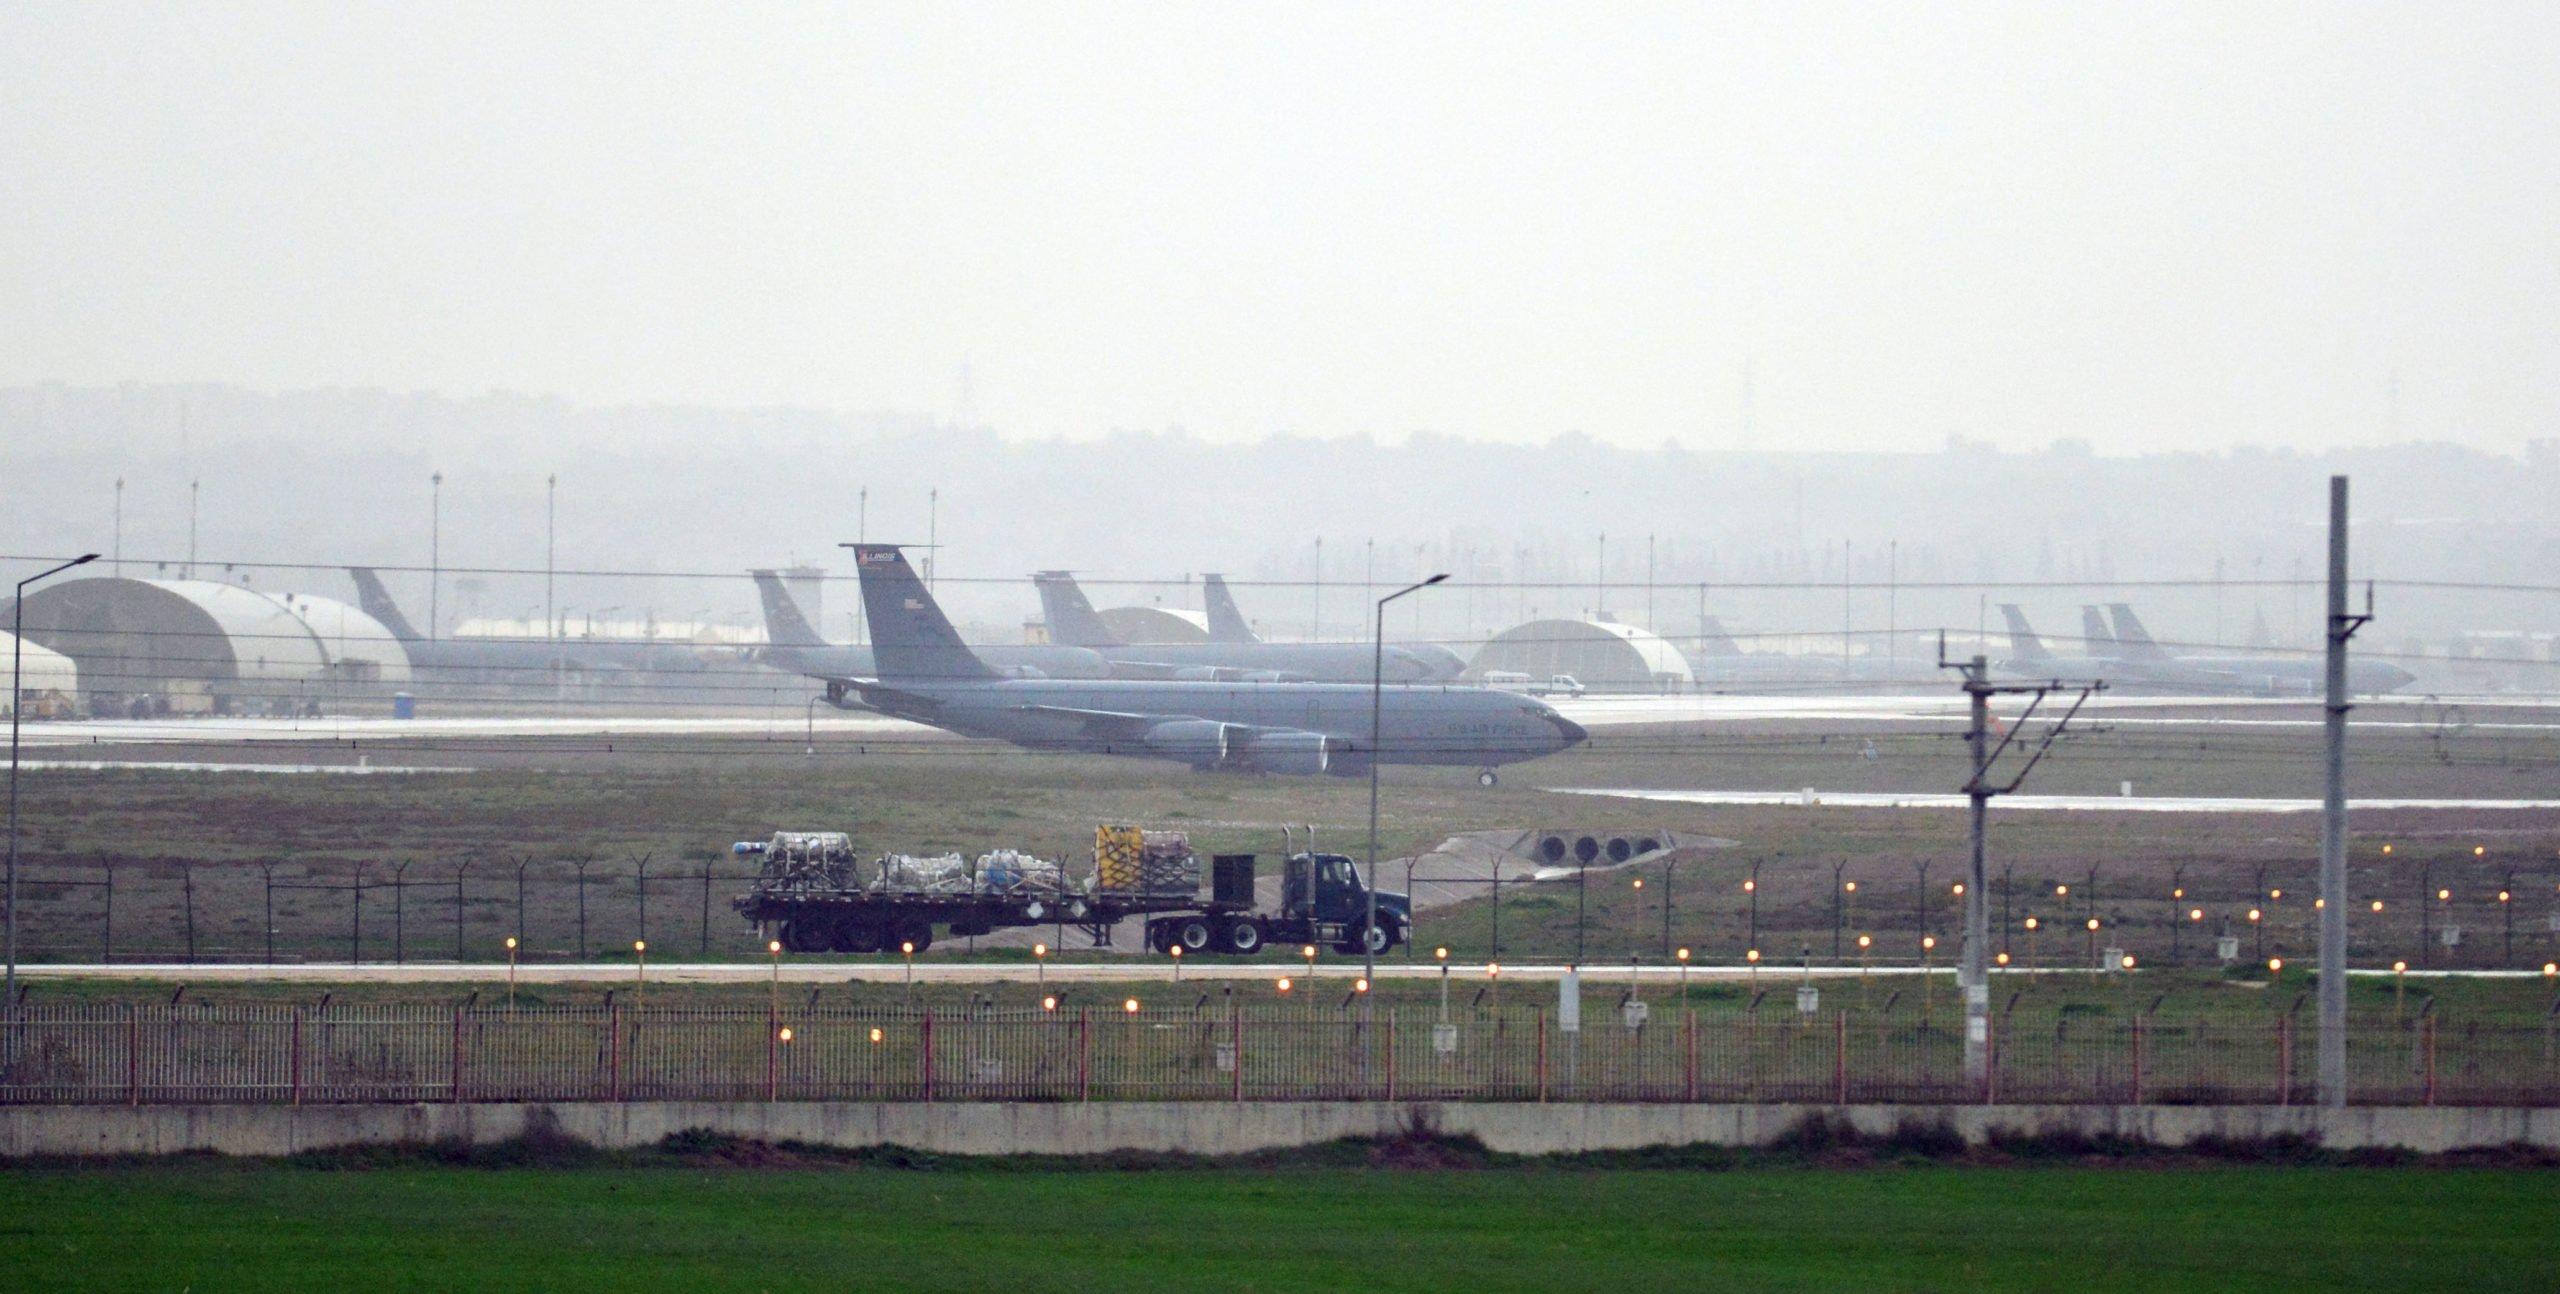 Turchia - ogive - Incirlick - Aviano